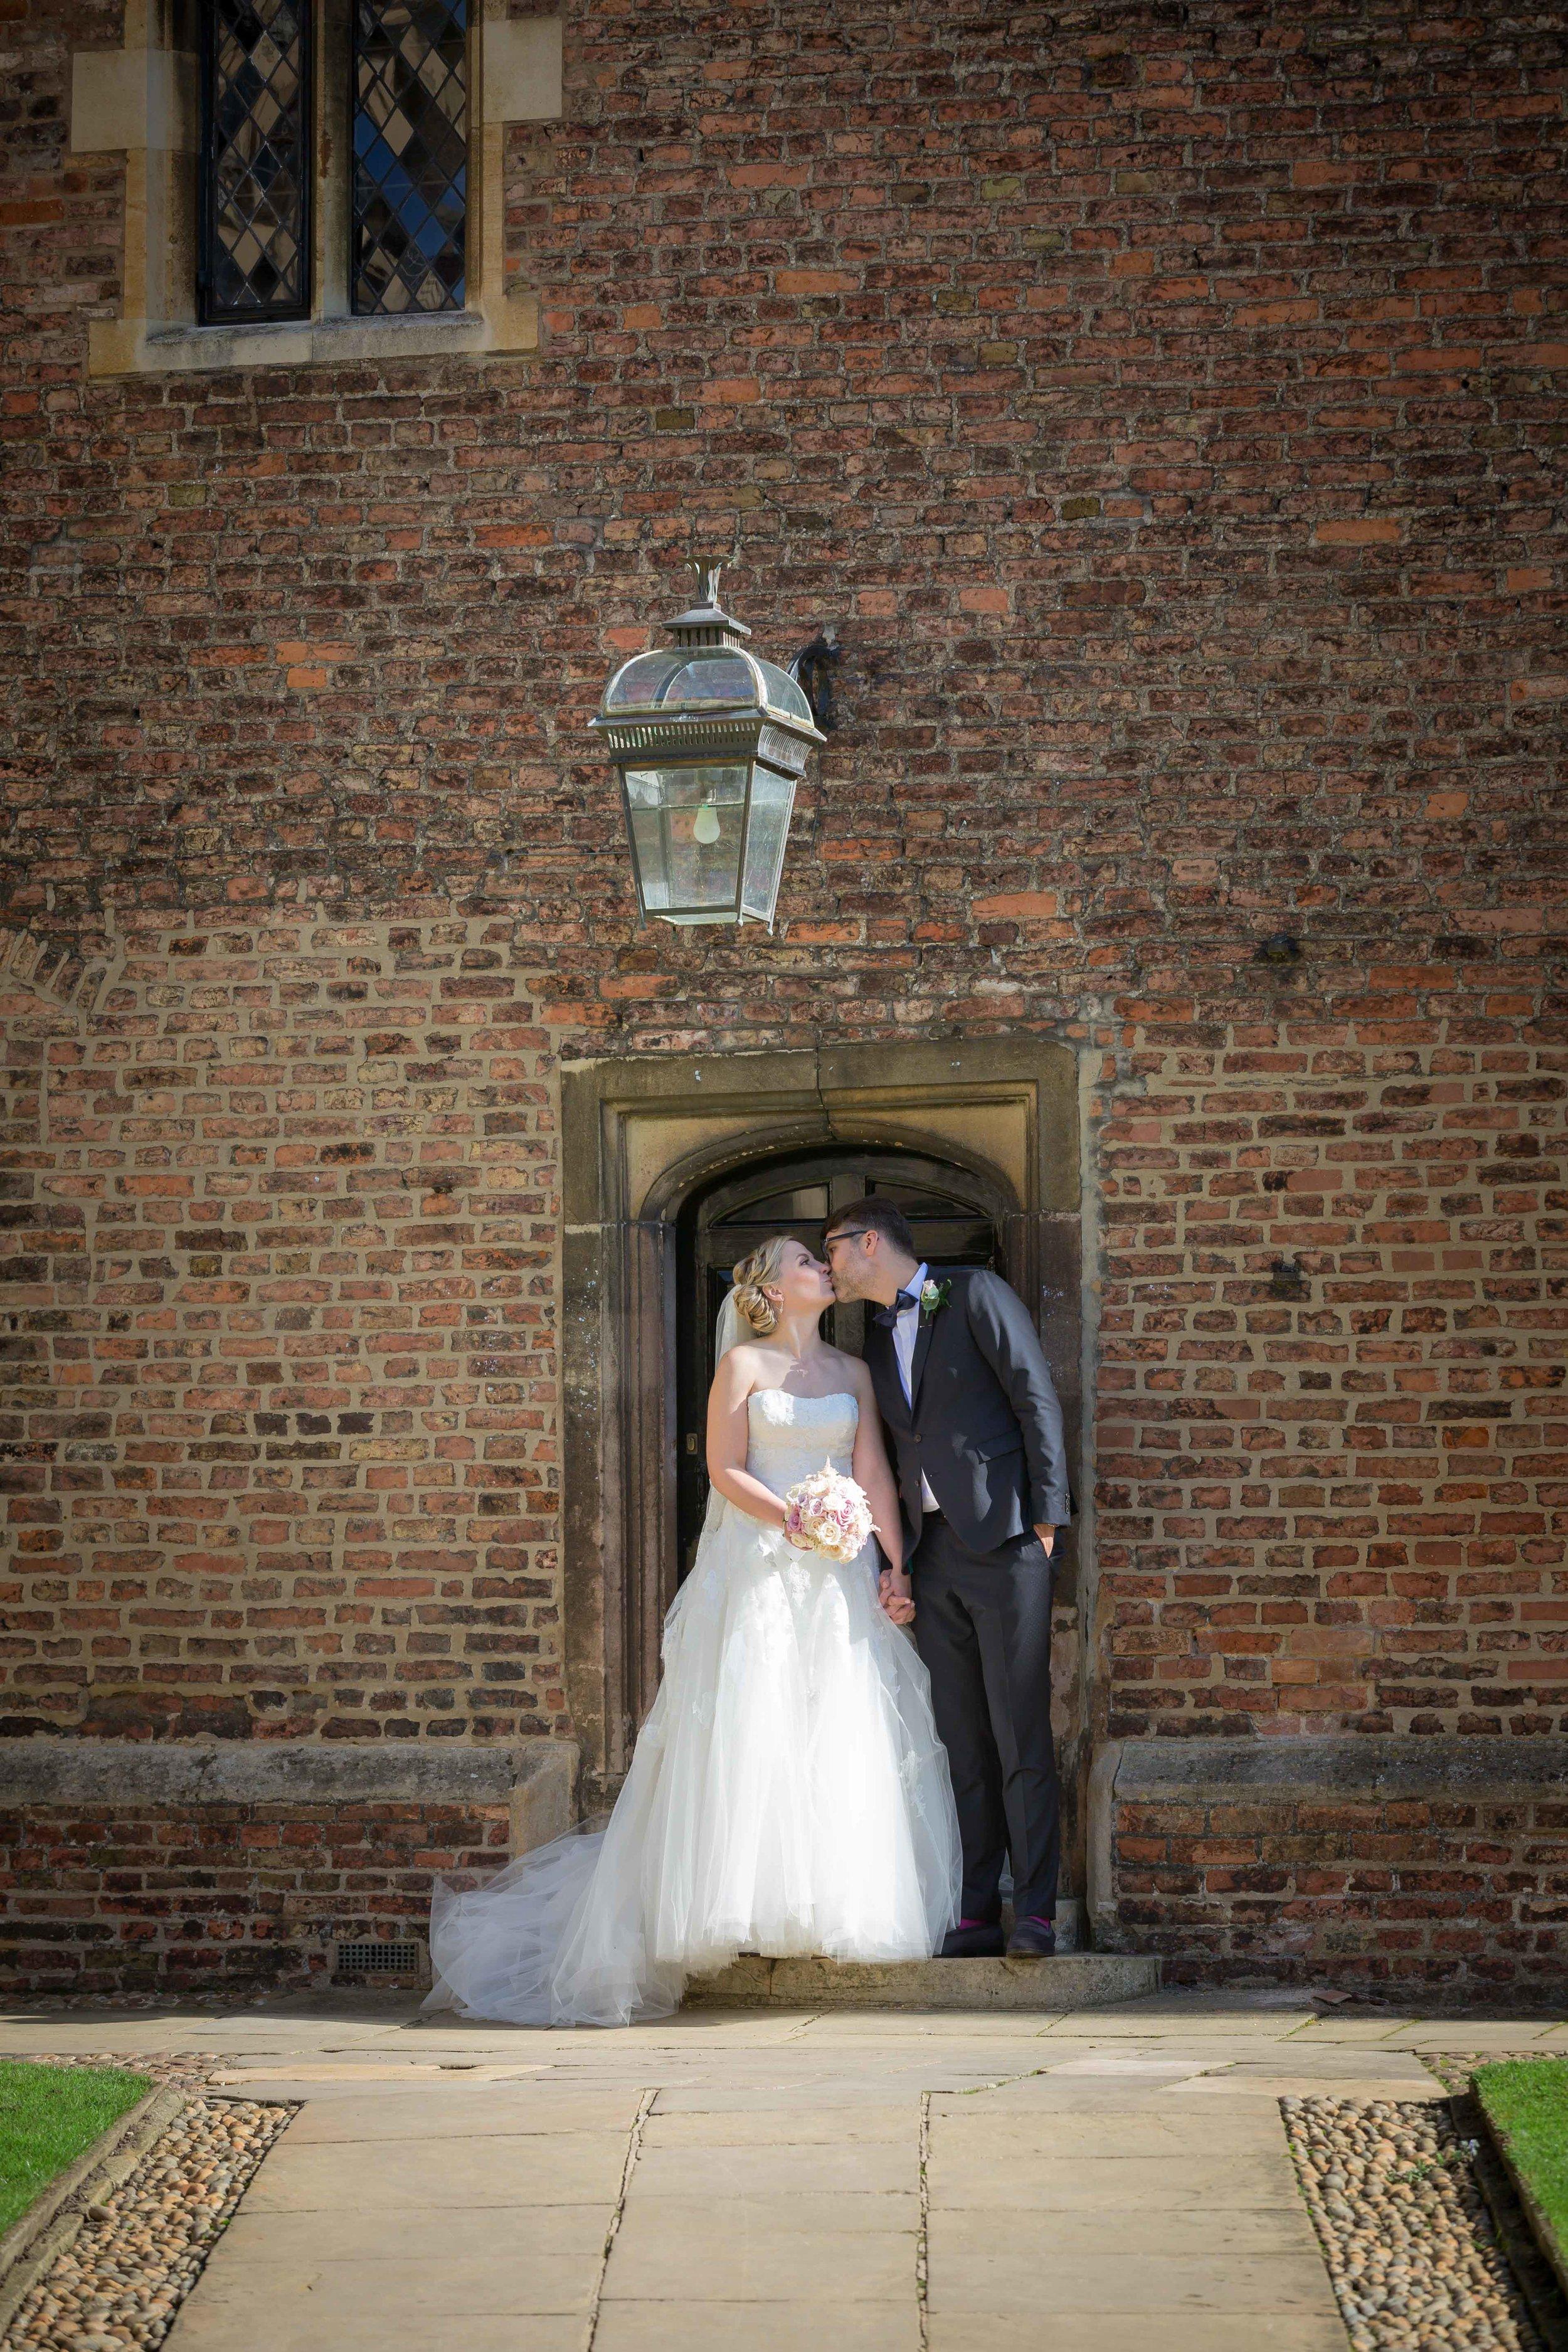 Adrian_Nicole_Charnwood_Weddings_Queens_College_Cambridge-1032.jpg